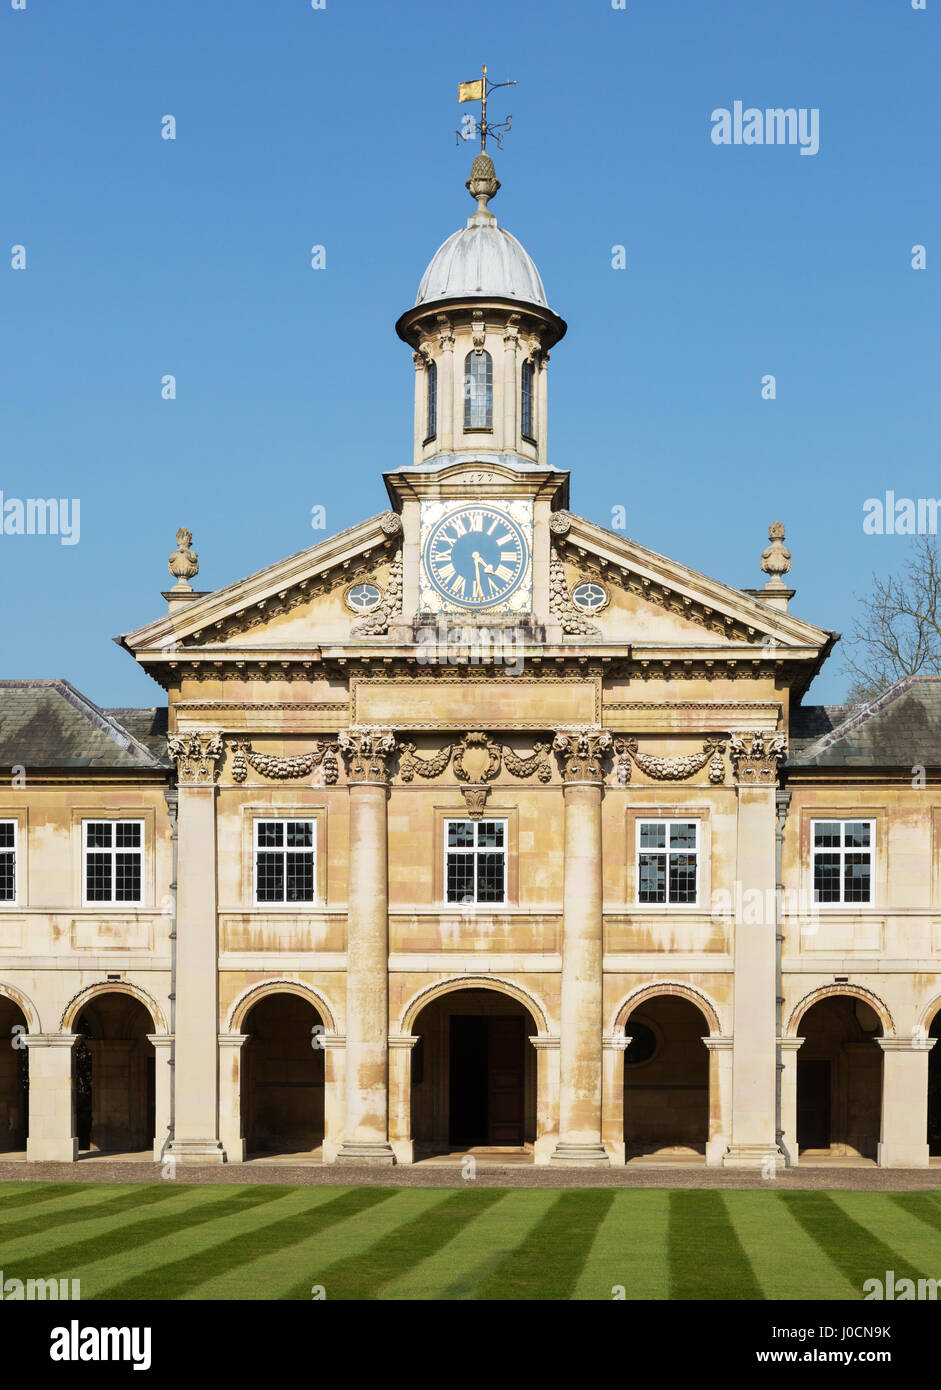 Emmanuel College Cambridge, a Cambridge University college, Cambridge England - Stock Image